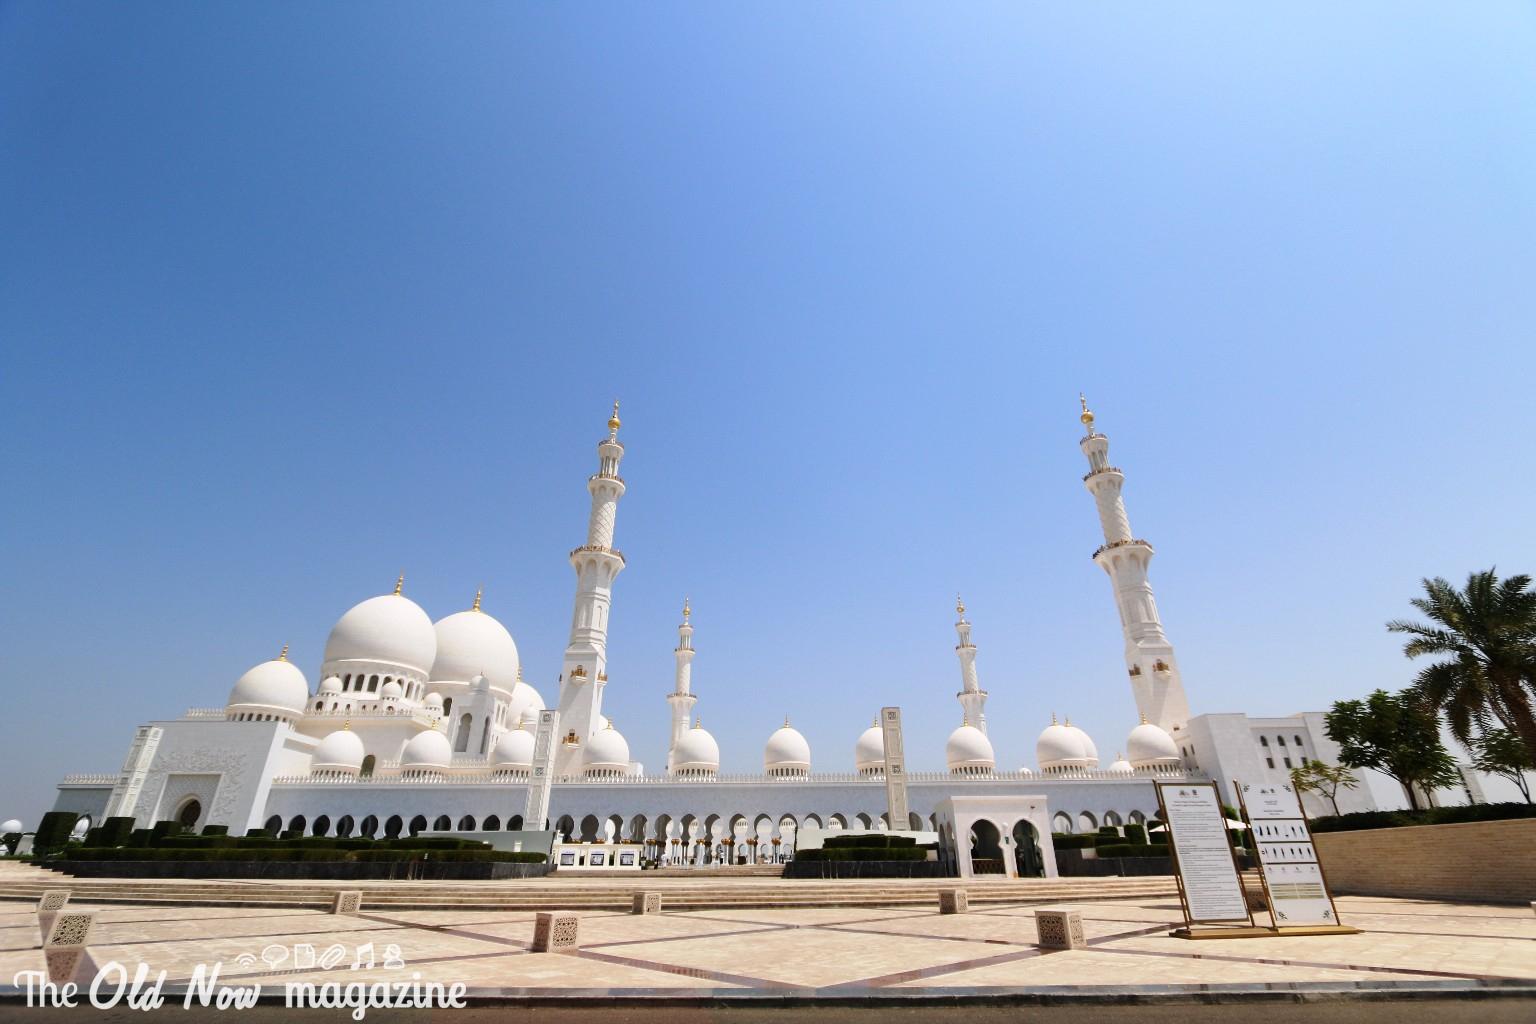 ABU-DHABI-GRAND-MOSQUE-THEOLDNOW-3